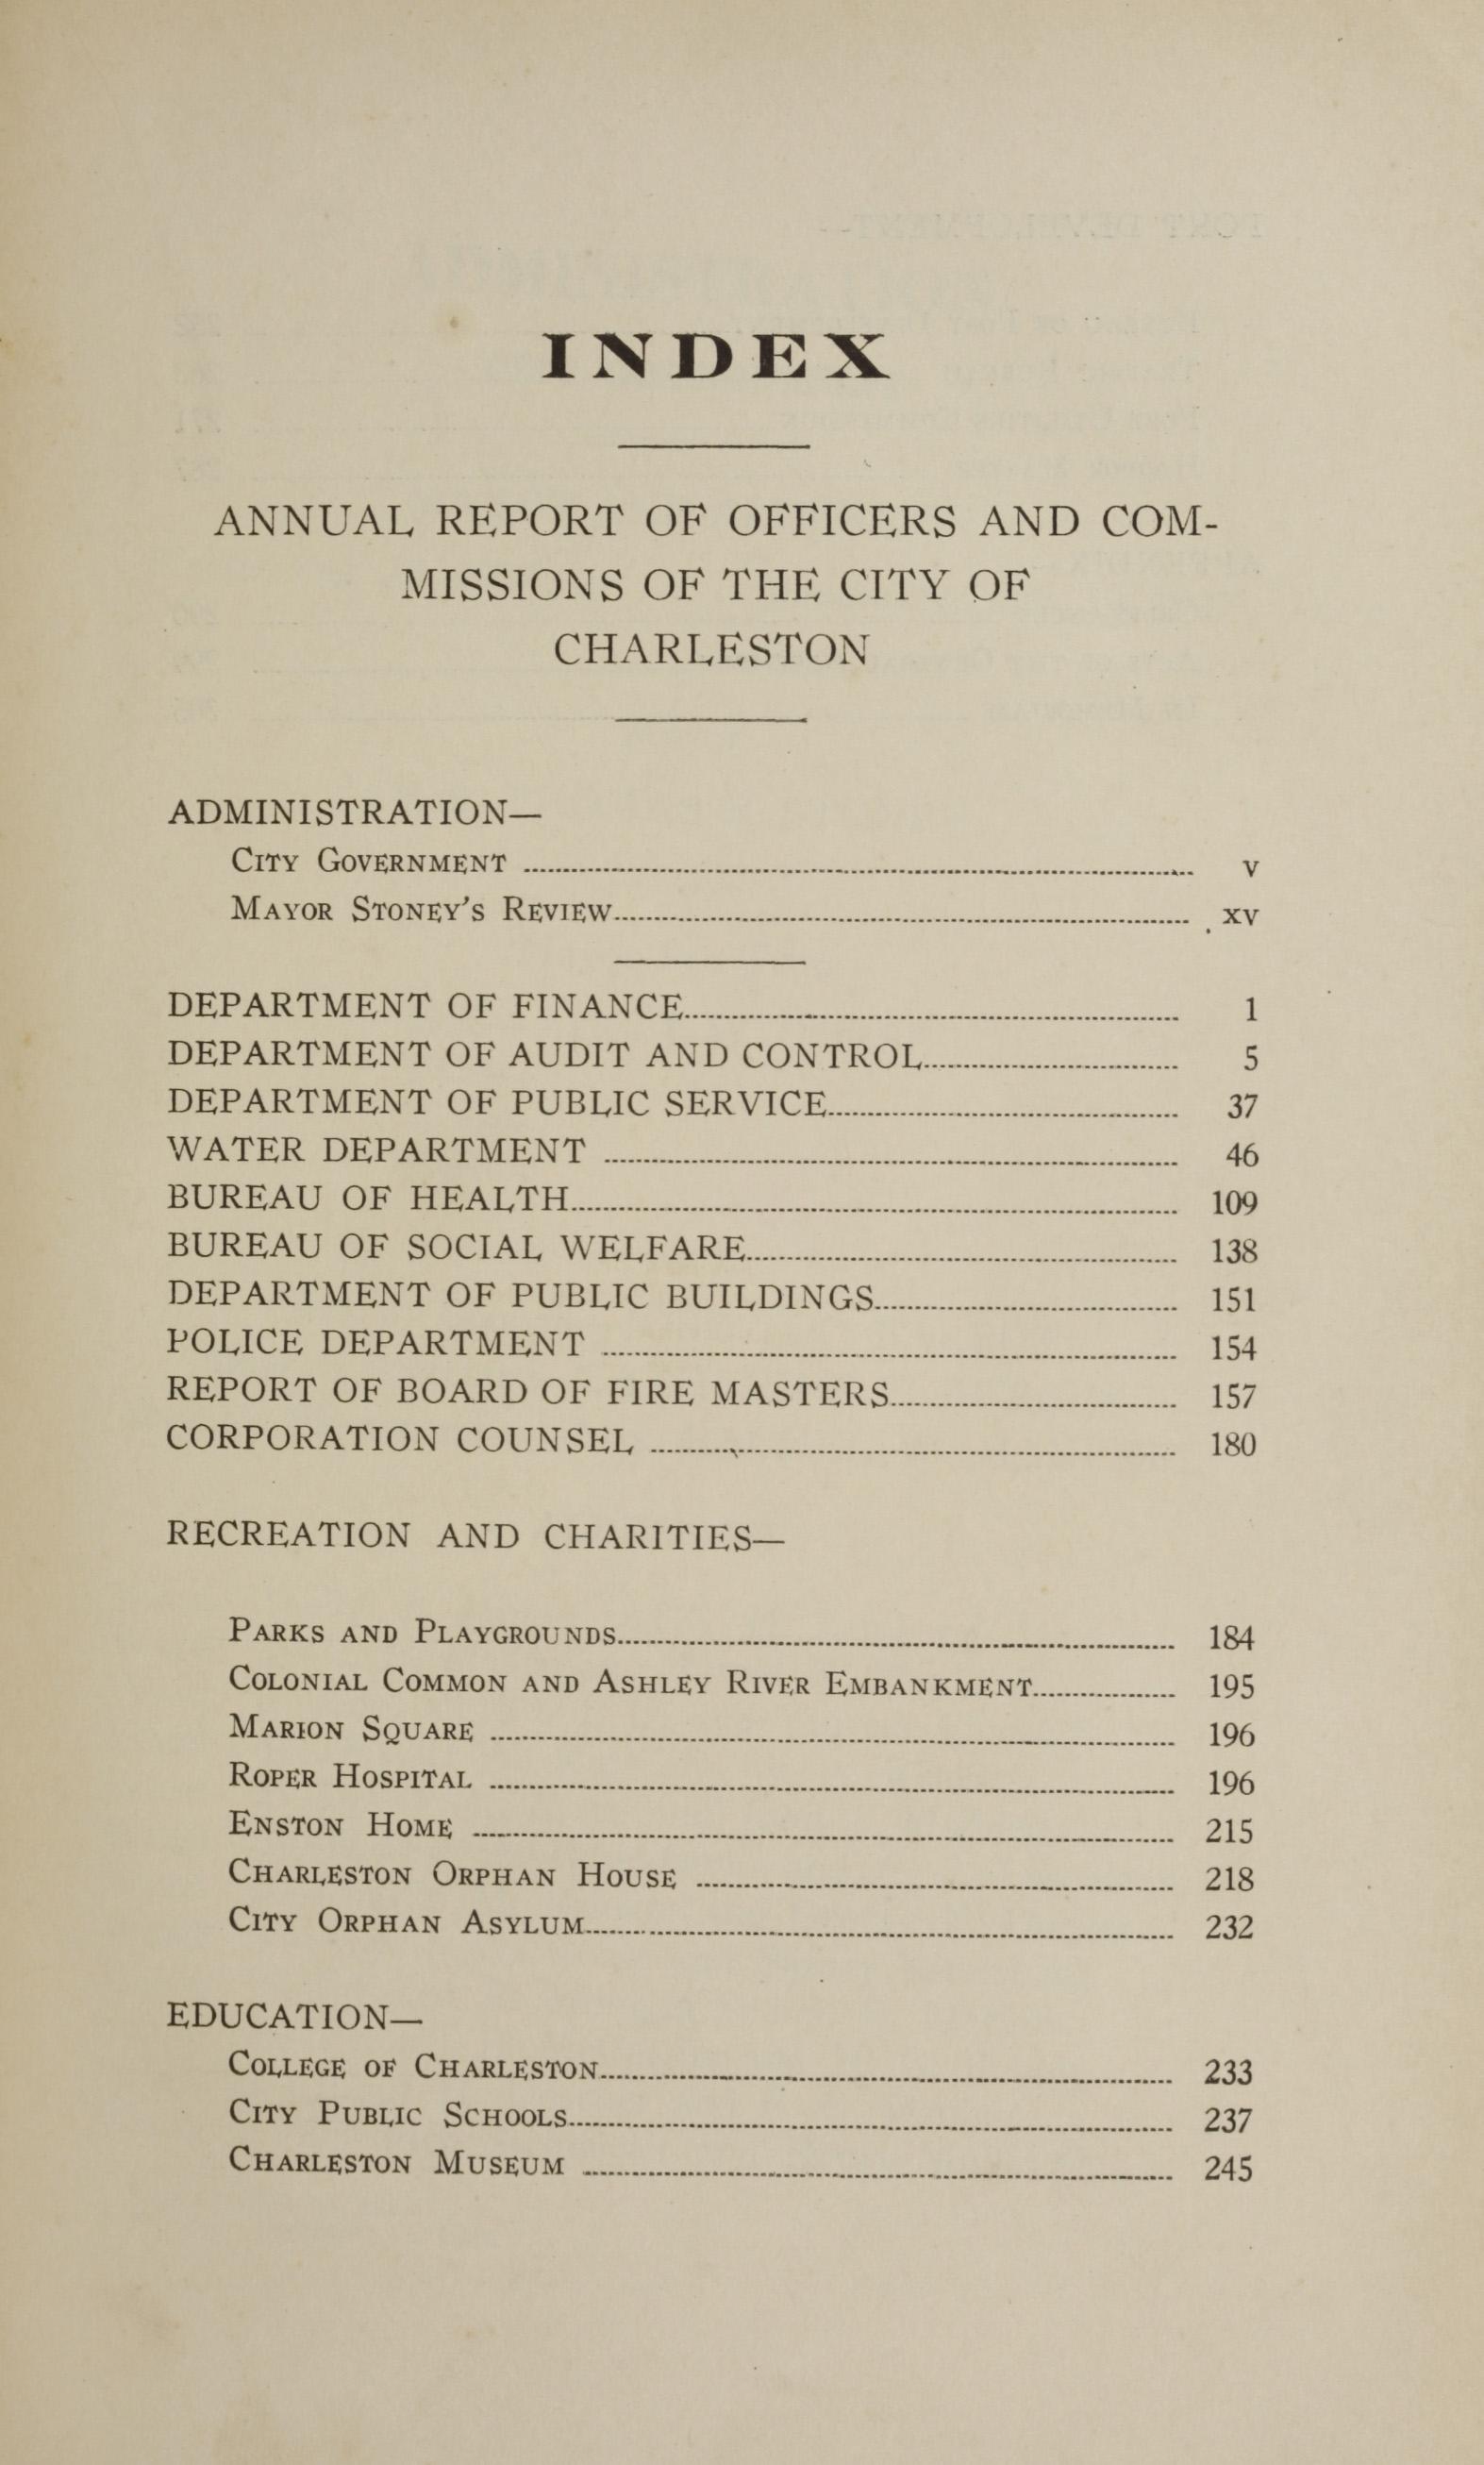 Charleston Yearbook, 1928, page iii